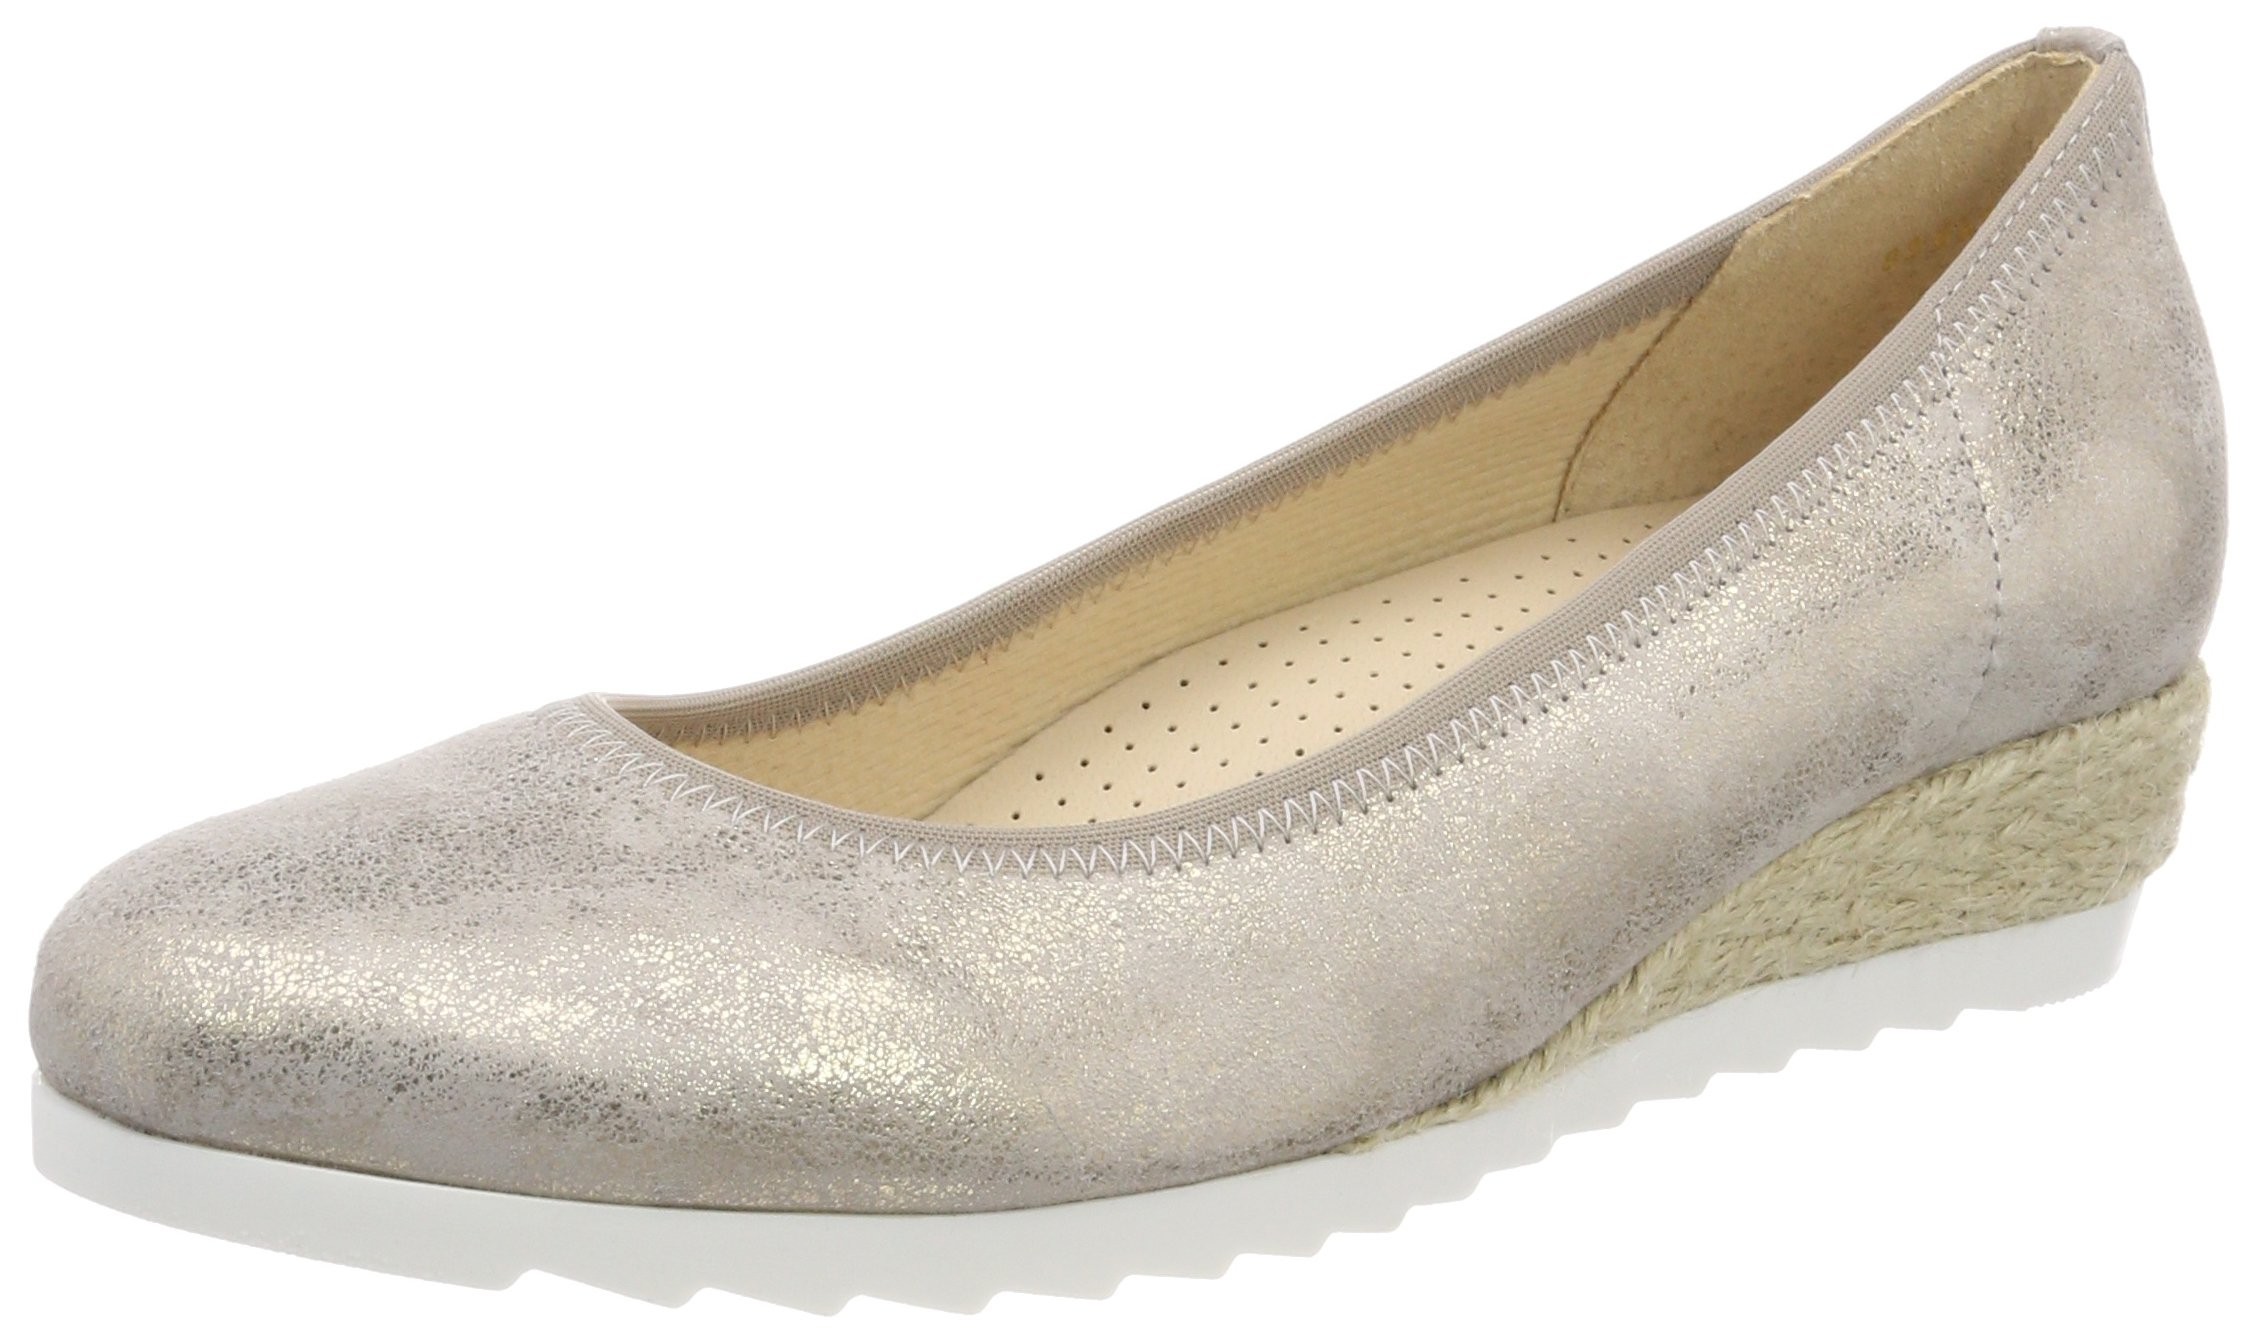 Gabor SportBallerines Jute40 FemmeBeigemuschel Shoes Eu Comfort CeWxBdroQ